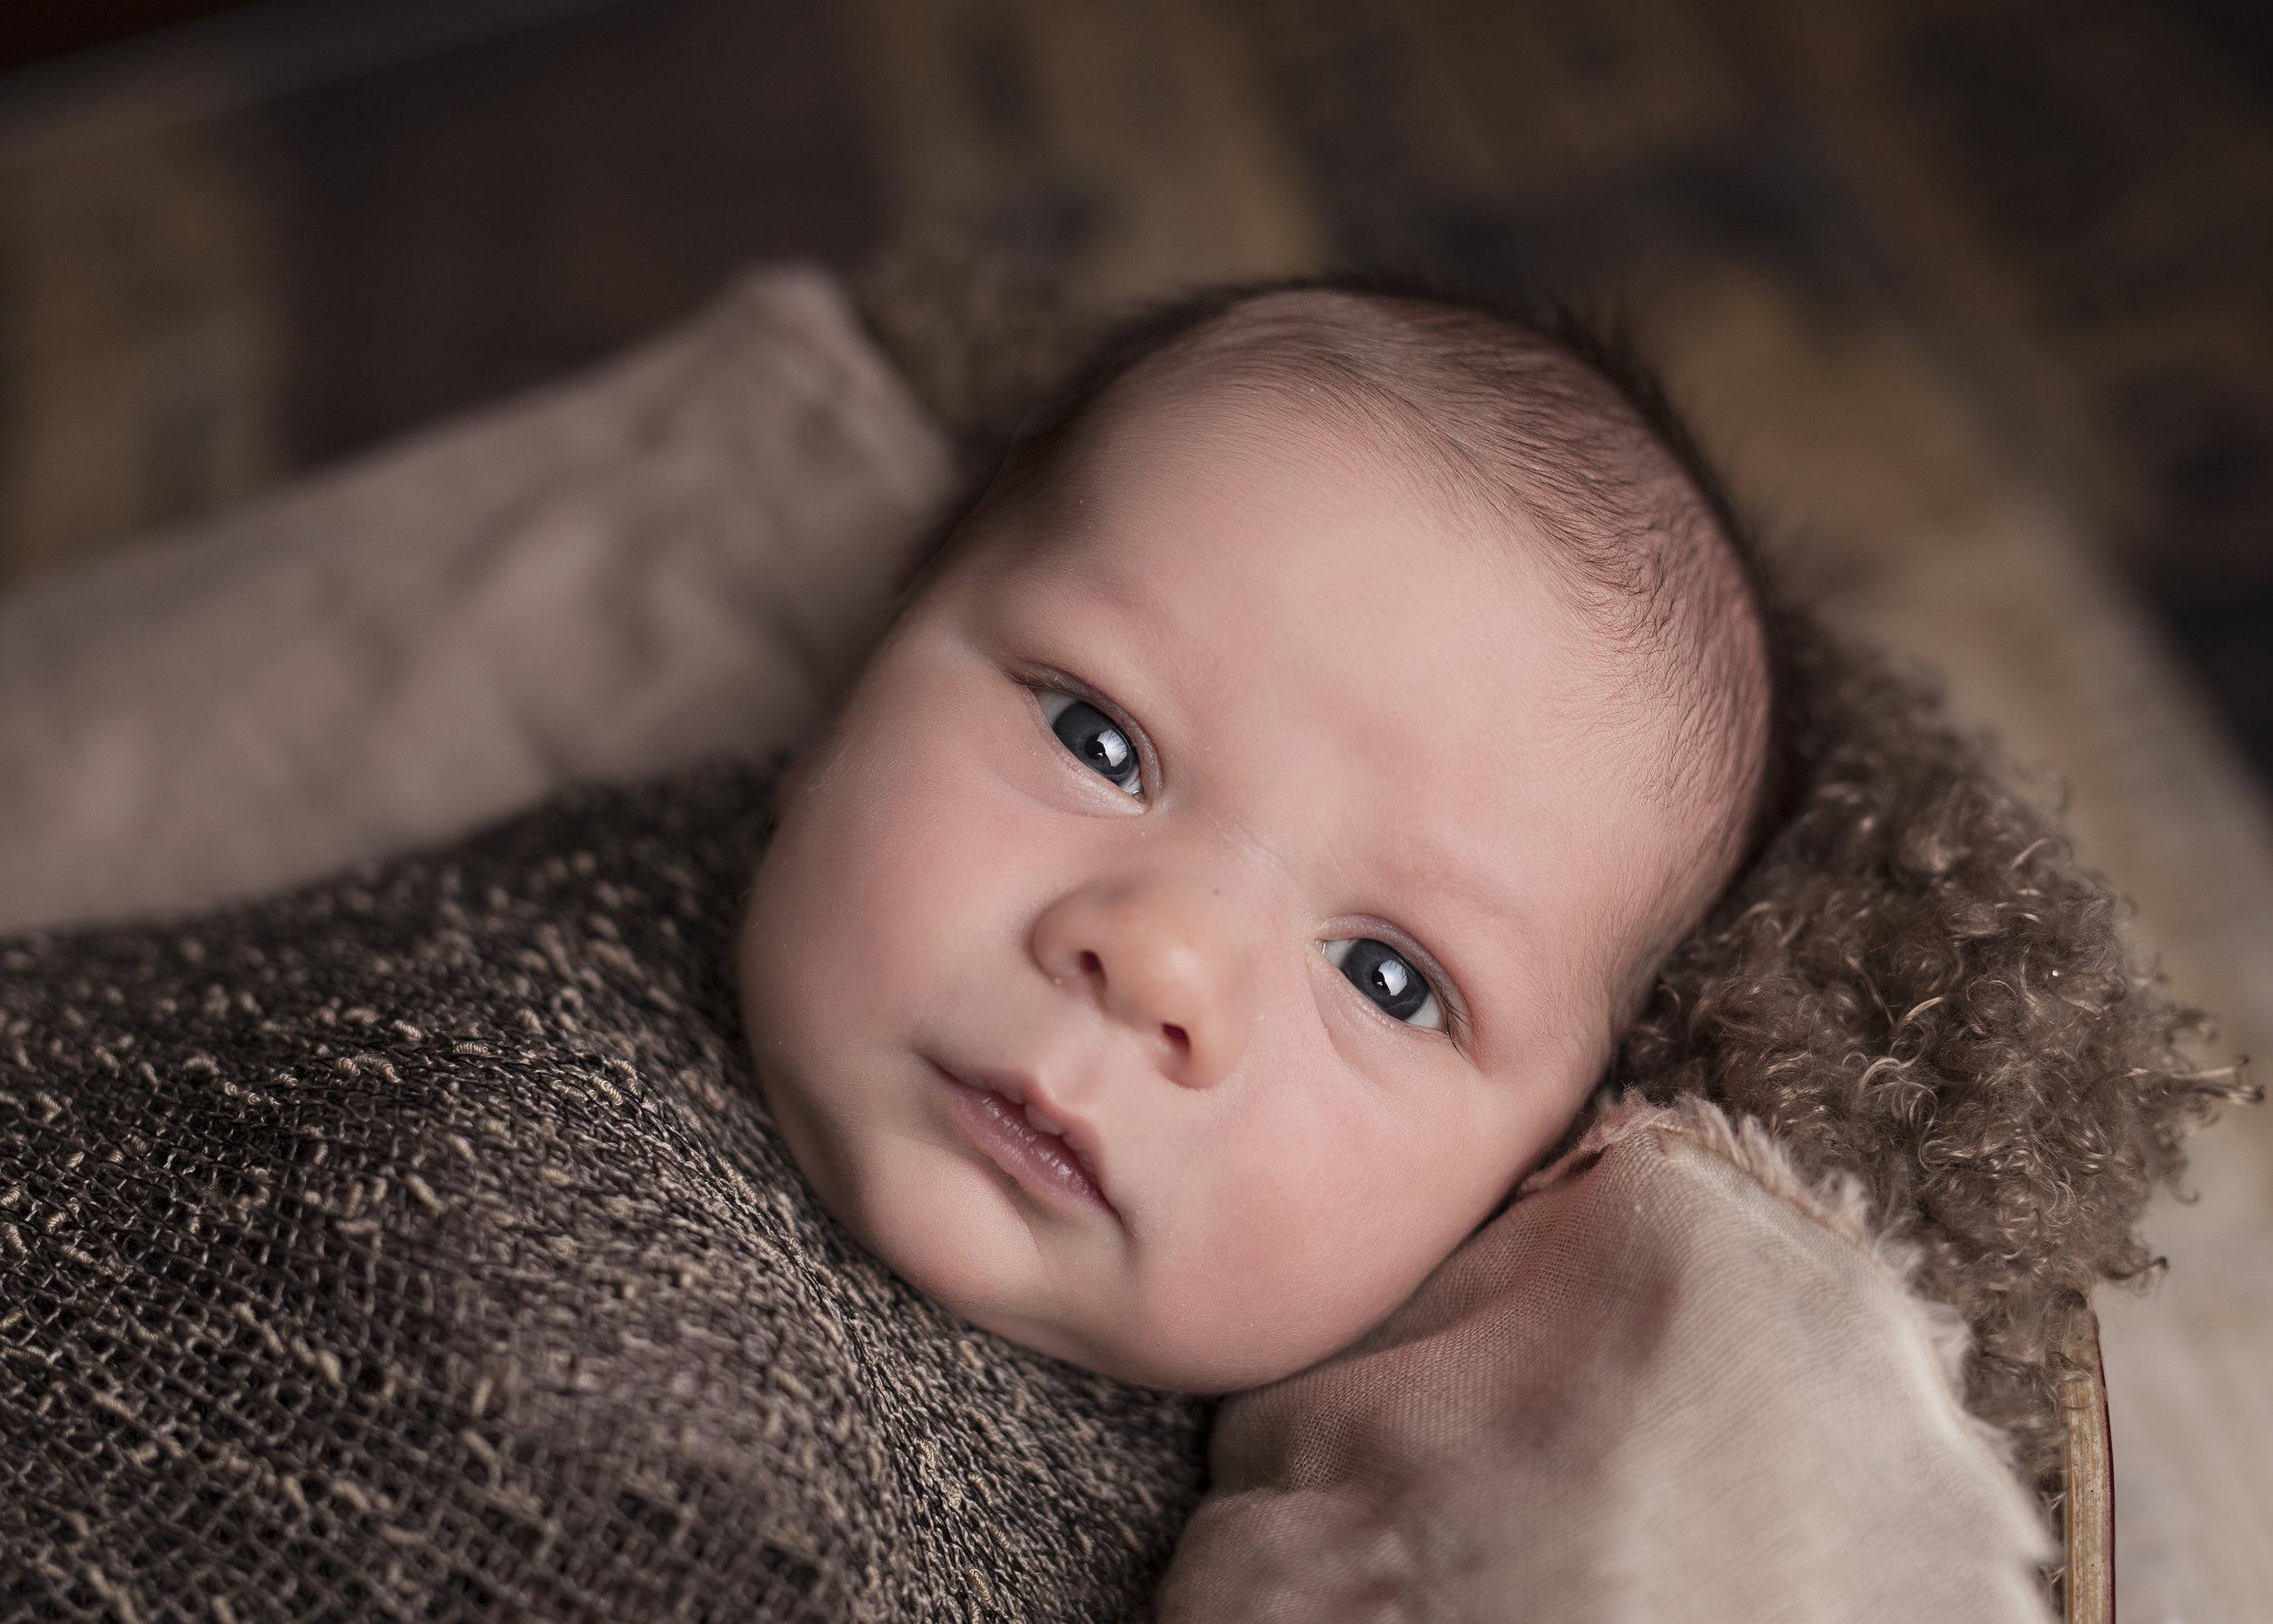 A generic newborn photograph